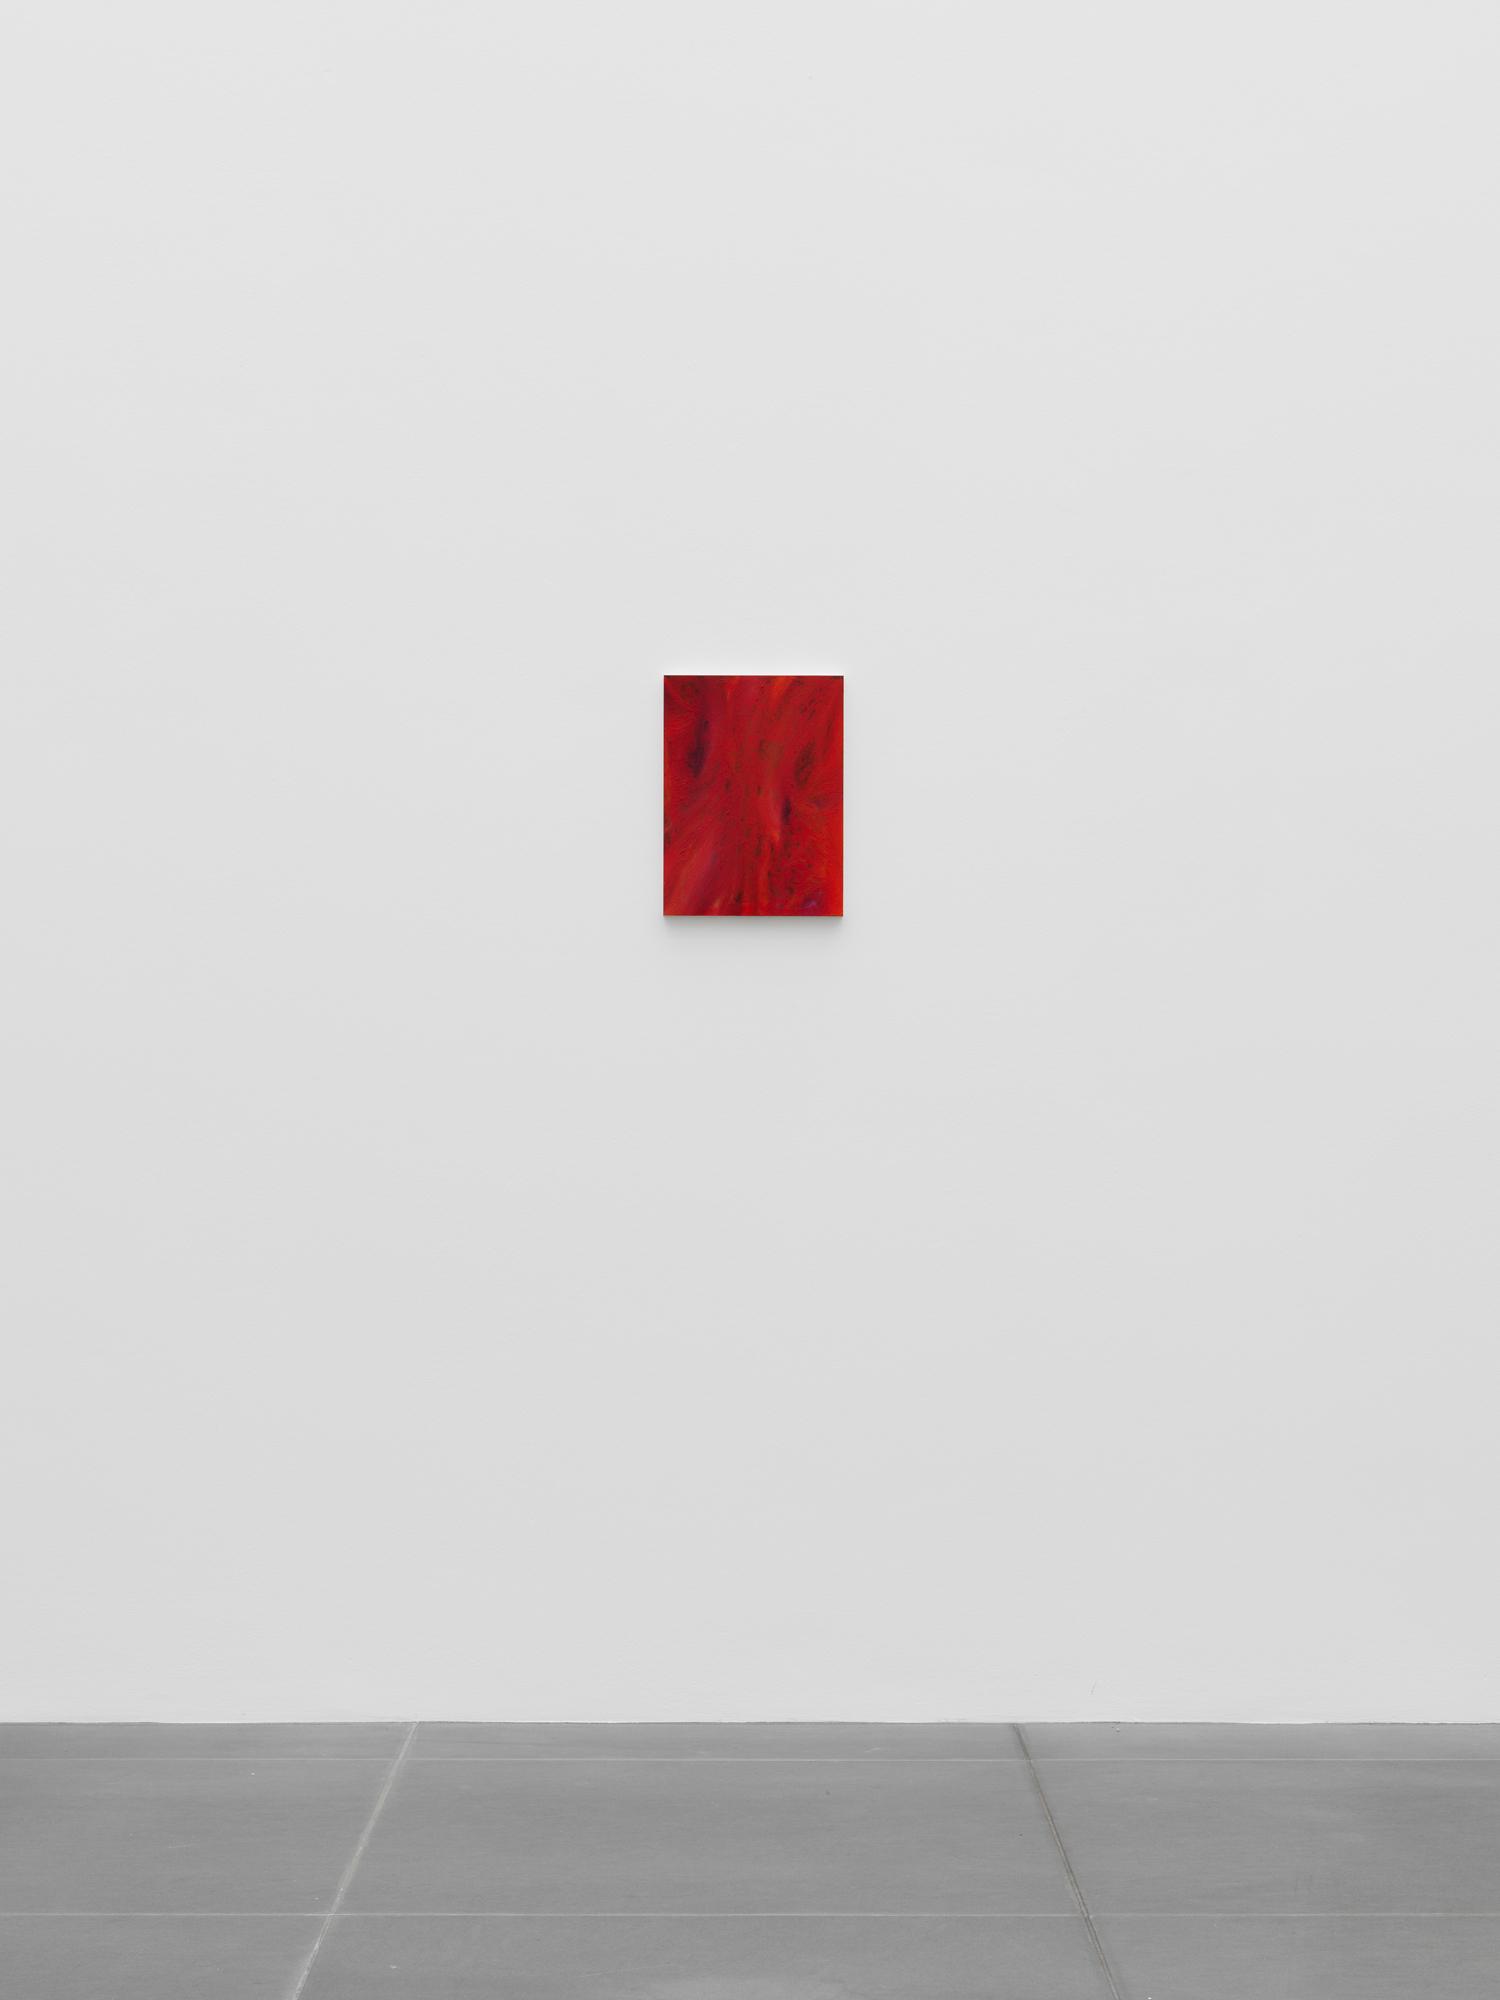 Michael Seidner. Siebzehn at Neues Museum